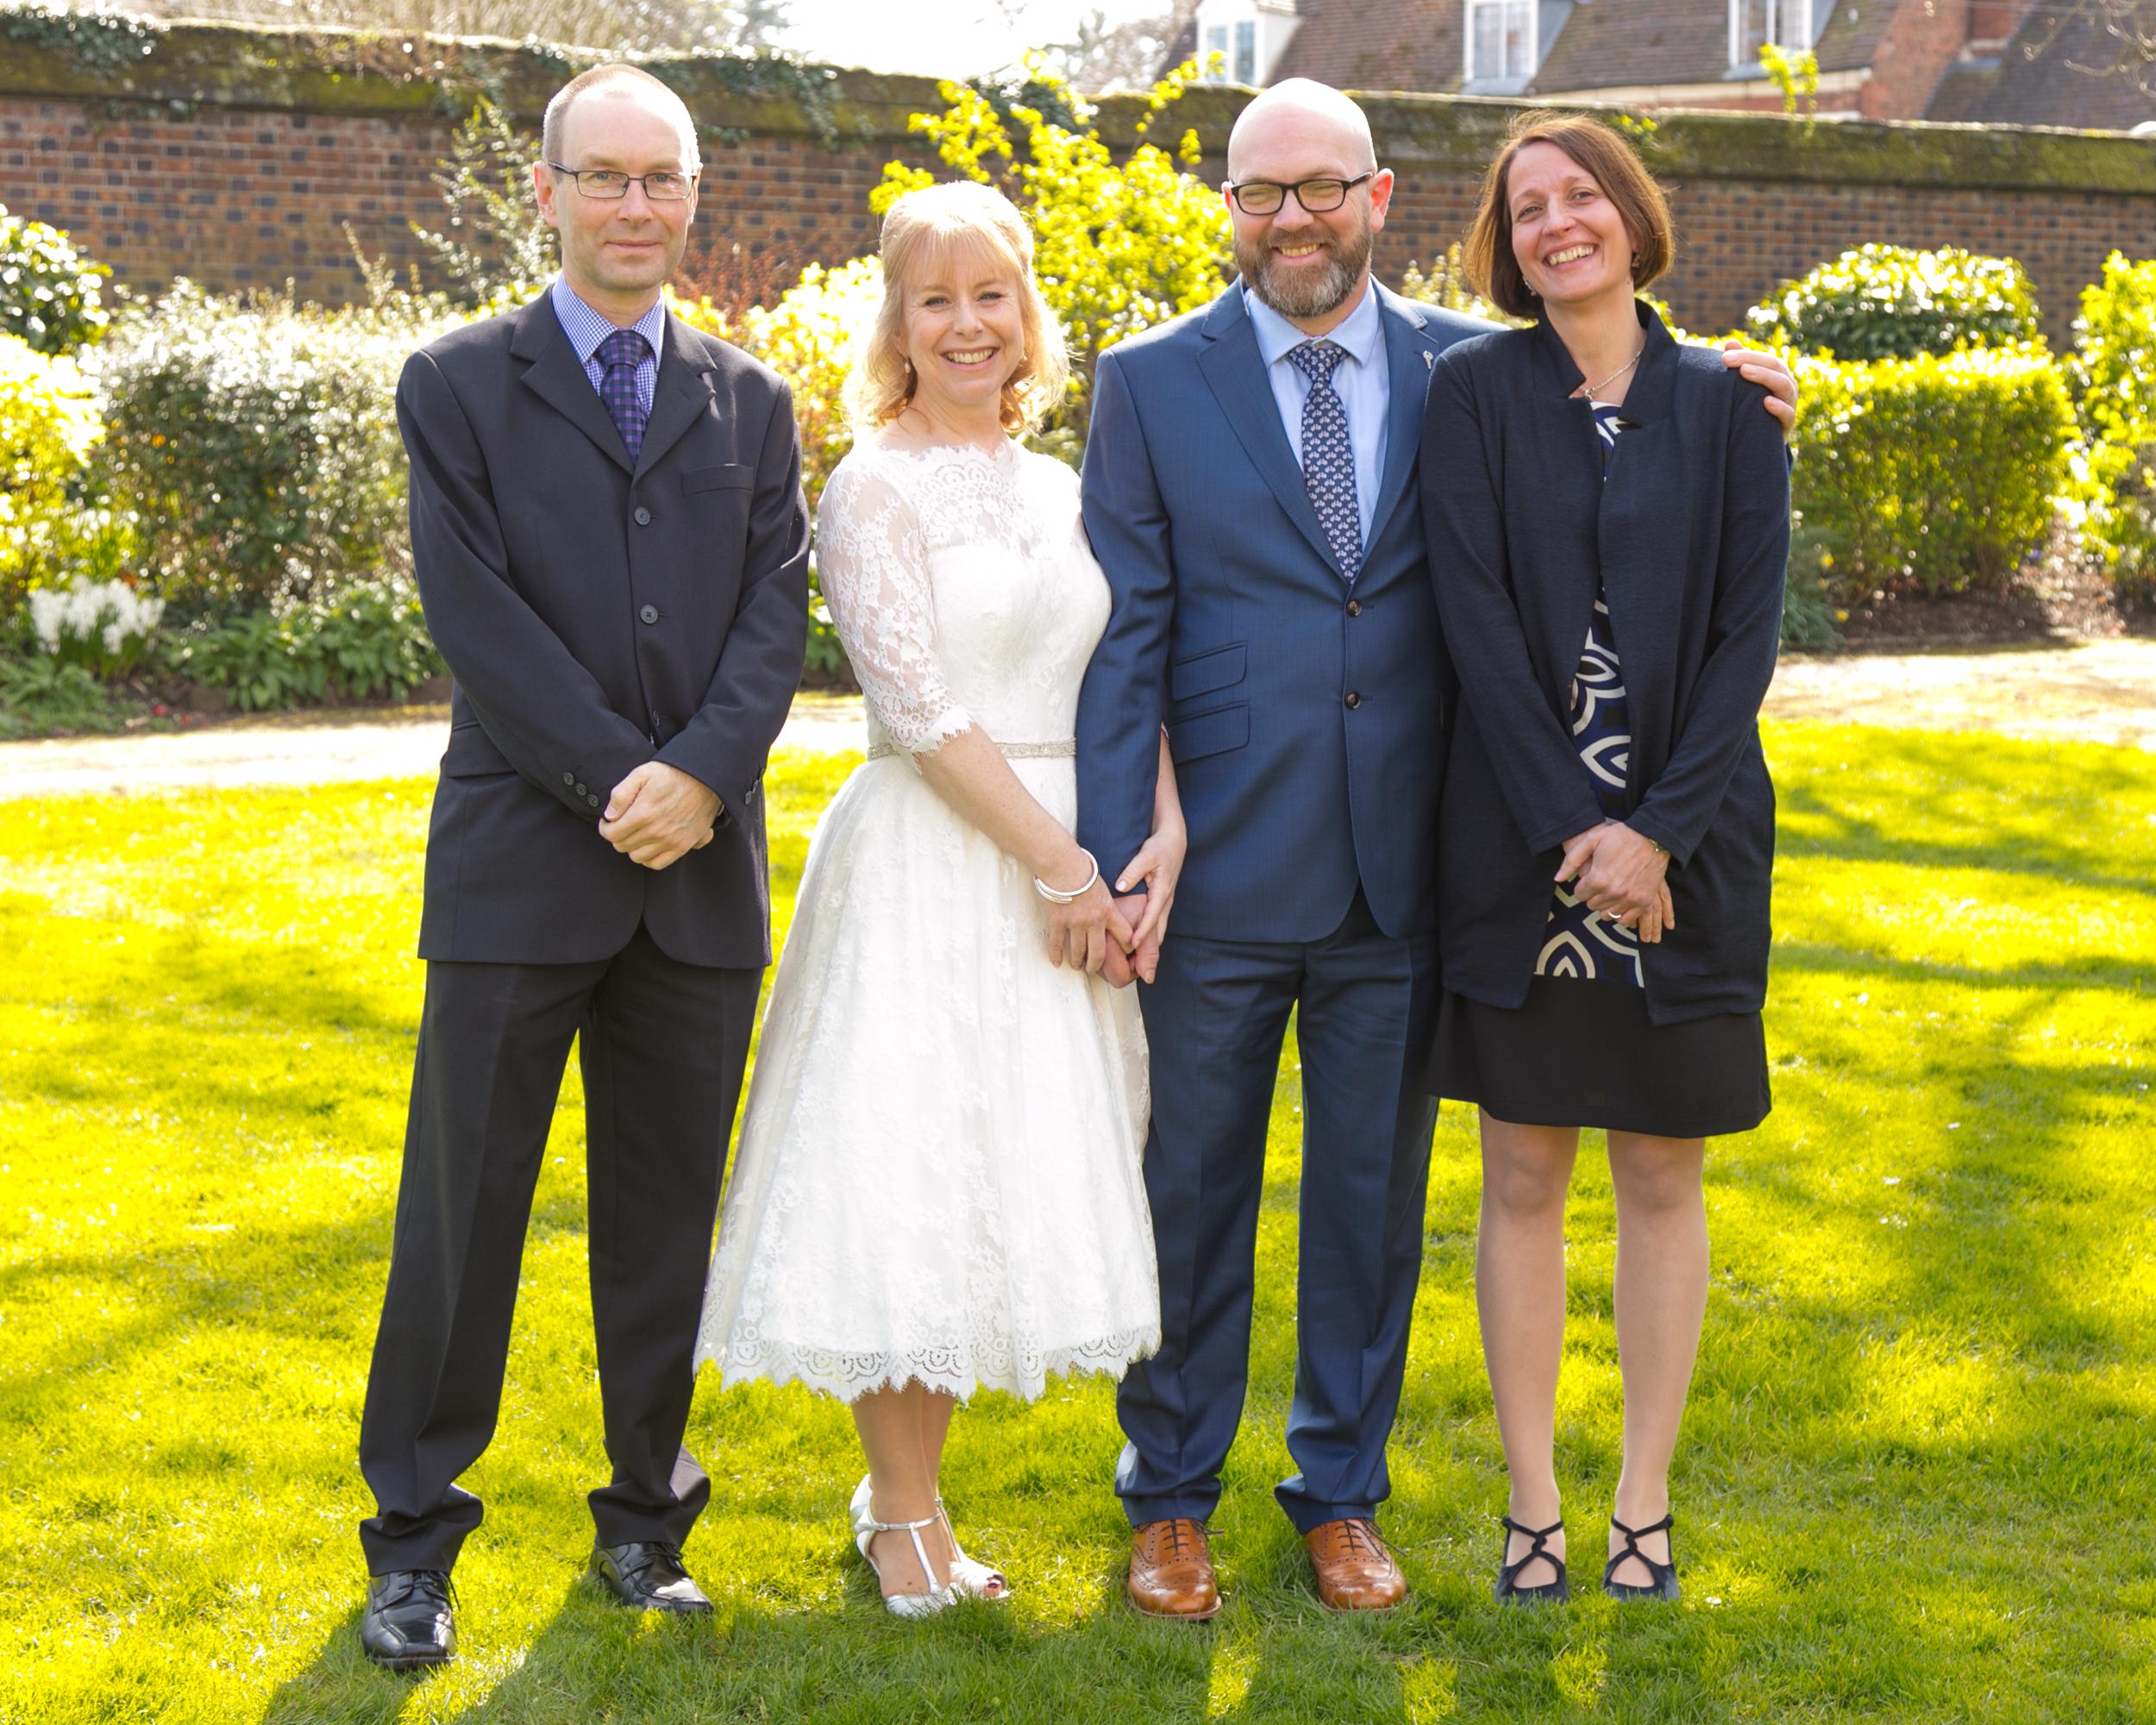 wedding-photography-at-Hill-Close-Gardens-Warwick57.jpg